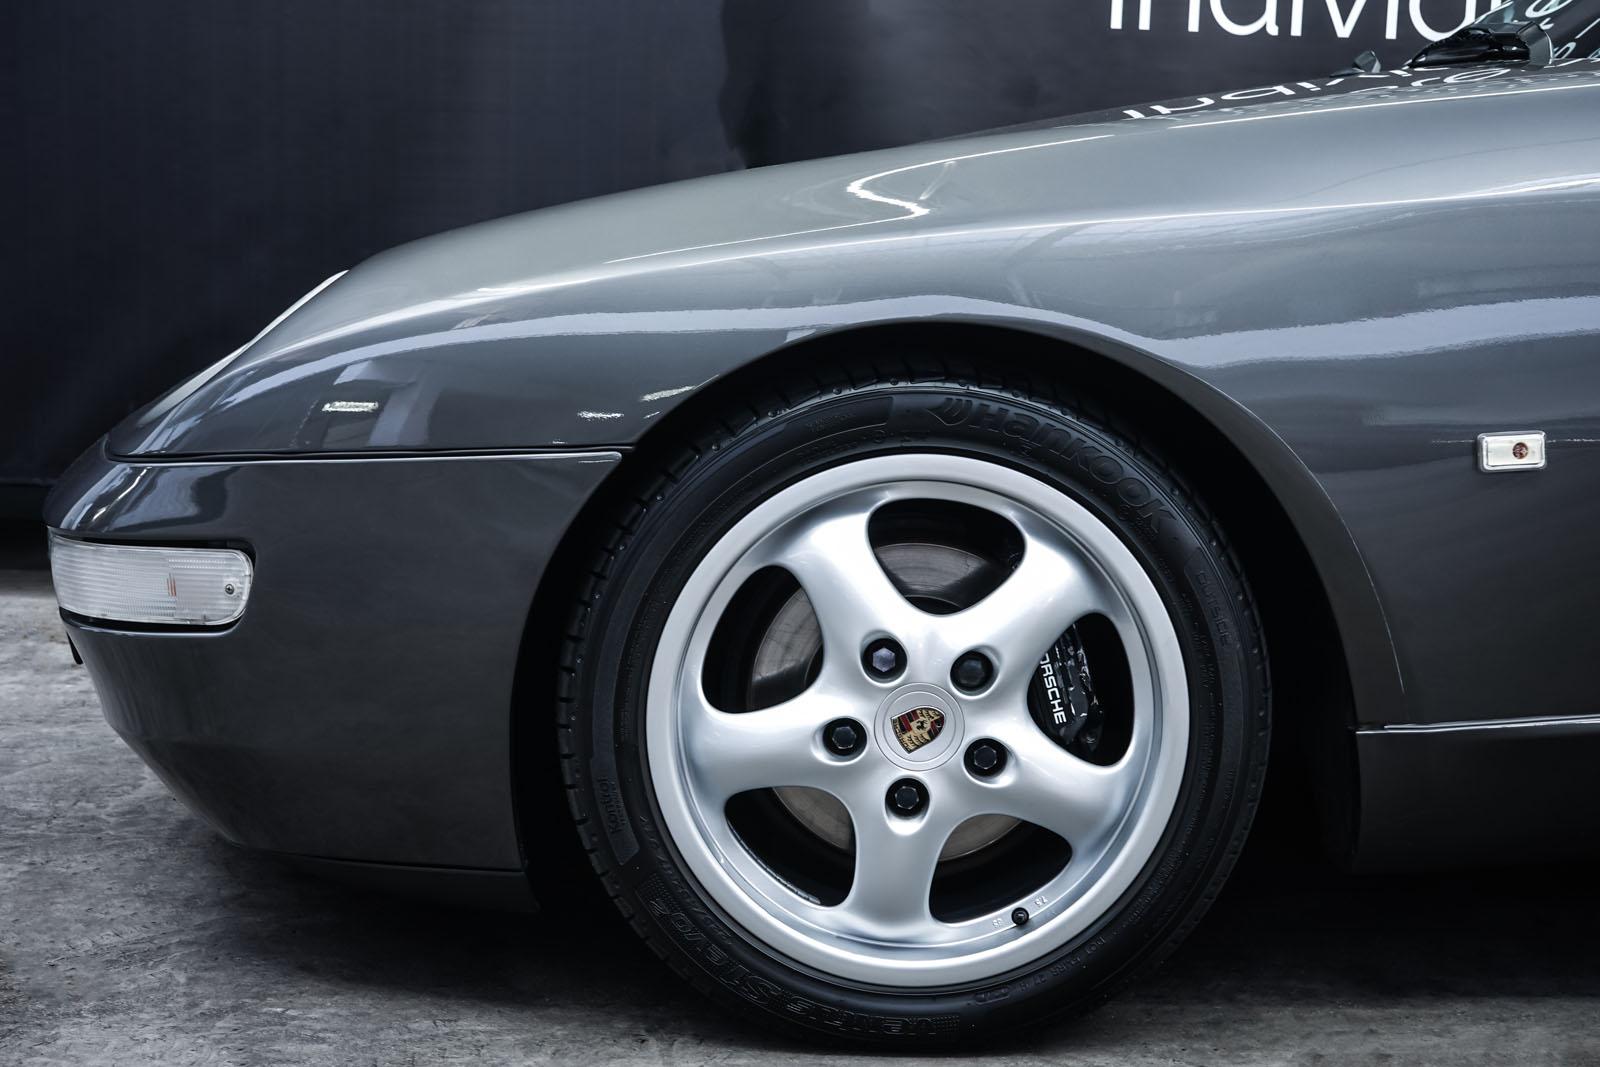 Porsche_986_Targa_Grau_Pink_POR-1092_3_w